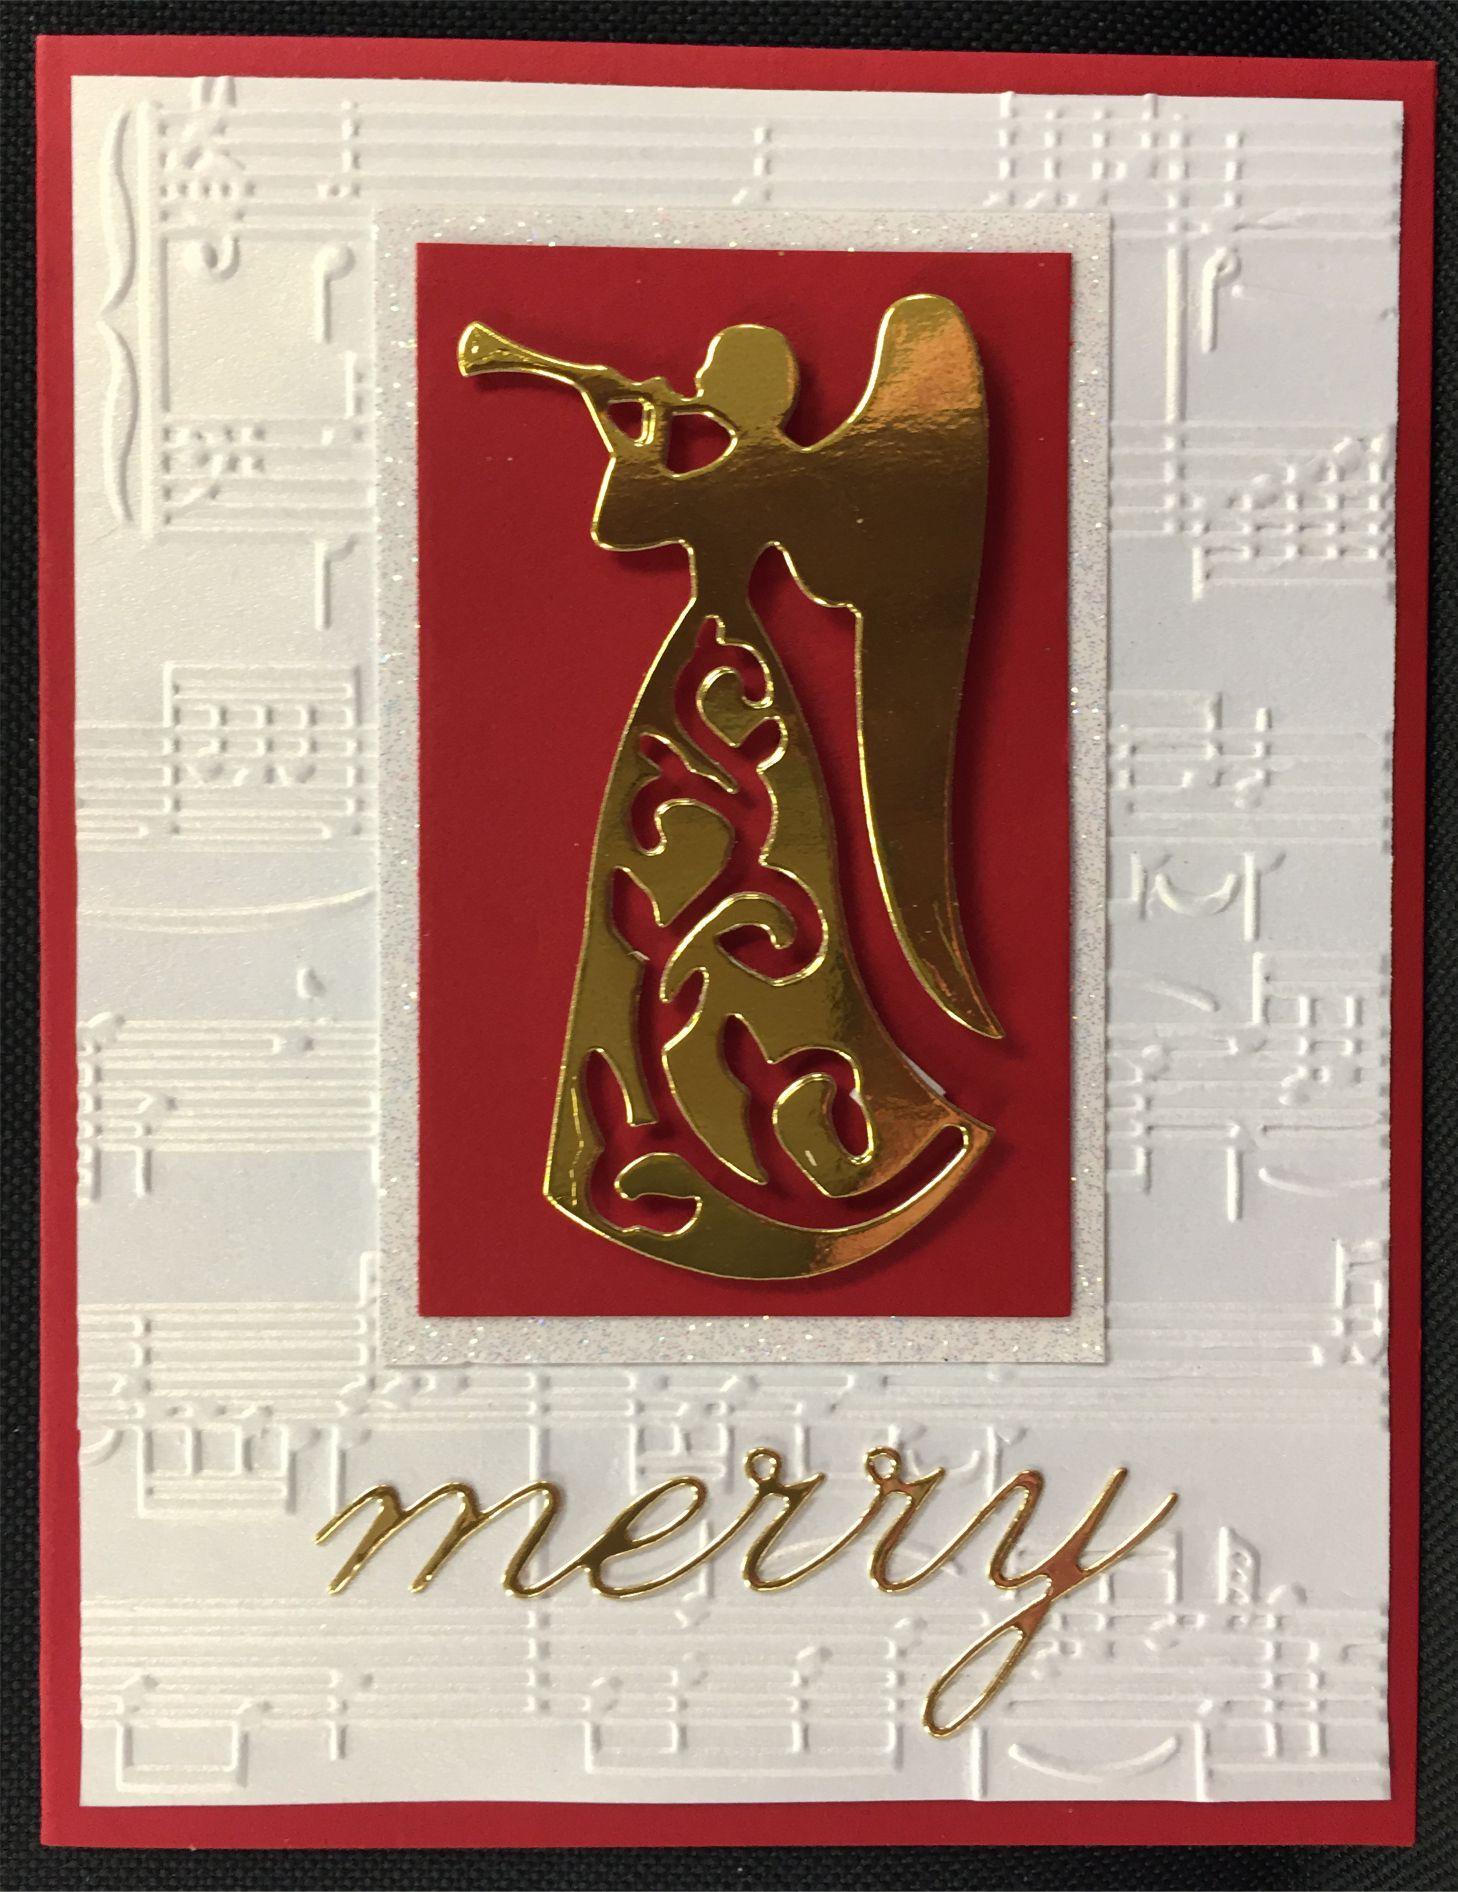 Heralding Angel Merry Christmas Card Inspiration Station